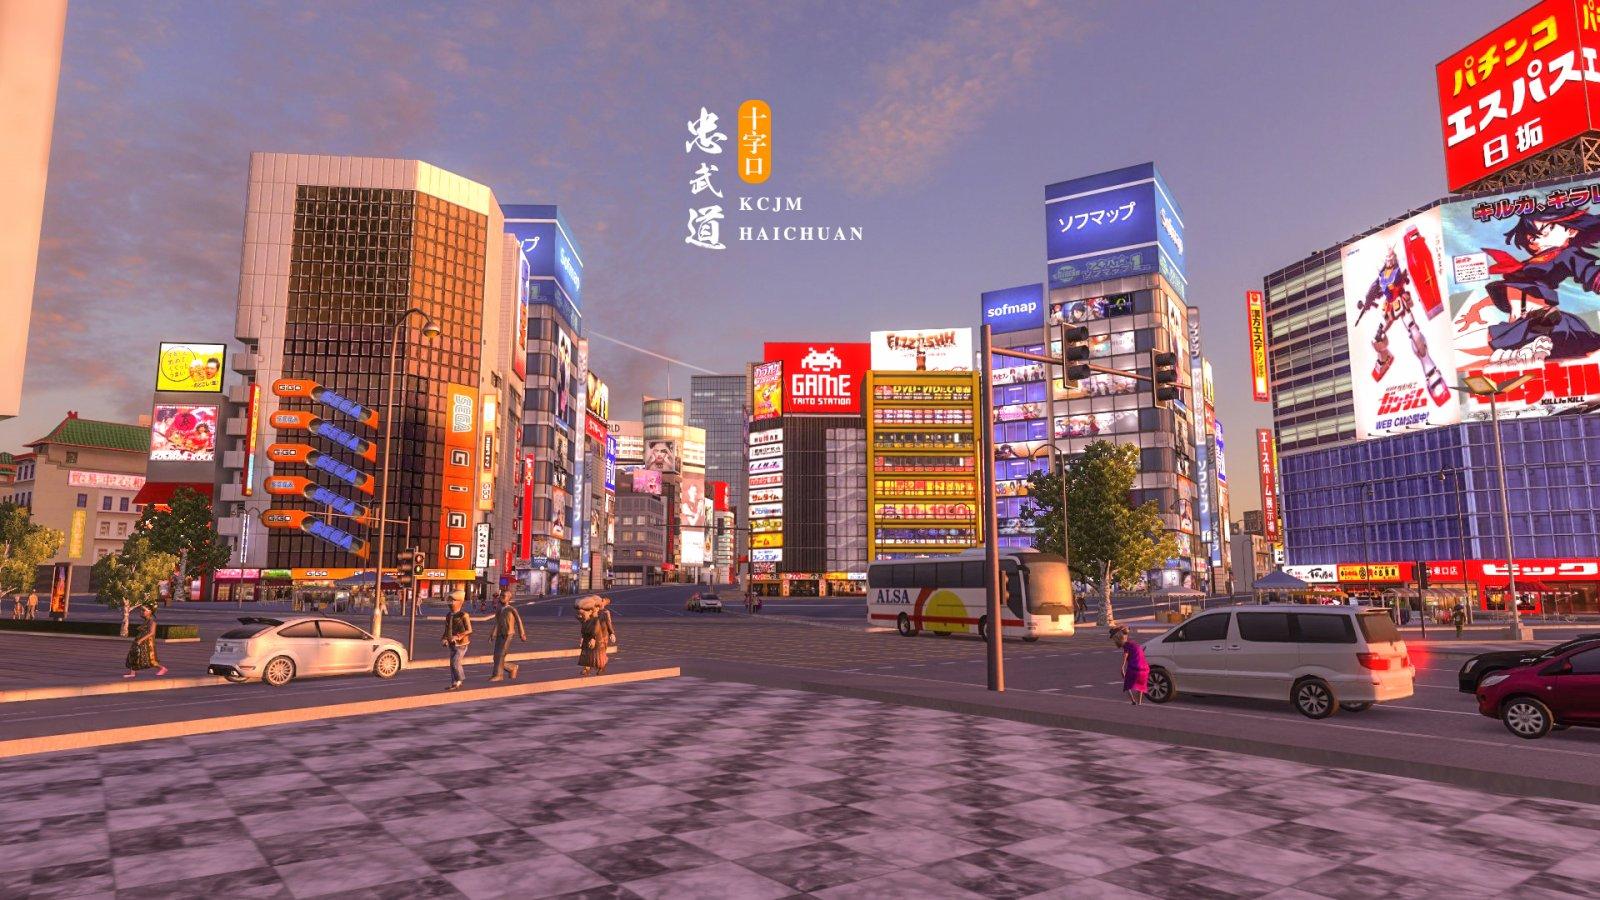 cxl_screenshot_haichuan_840.jpg